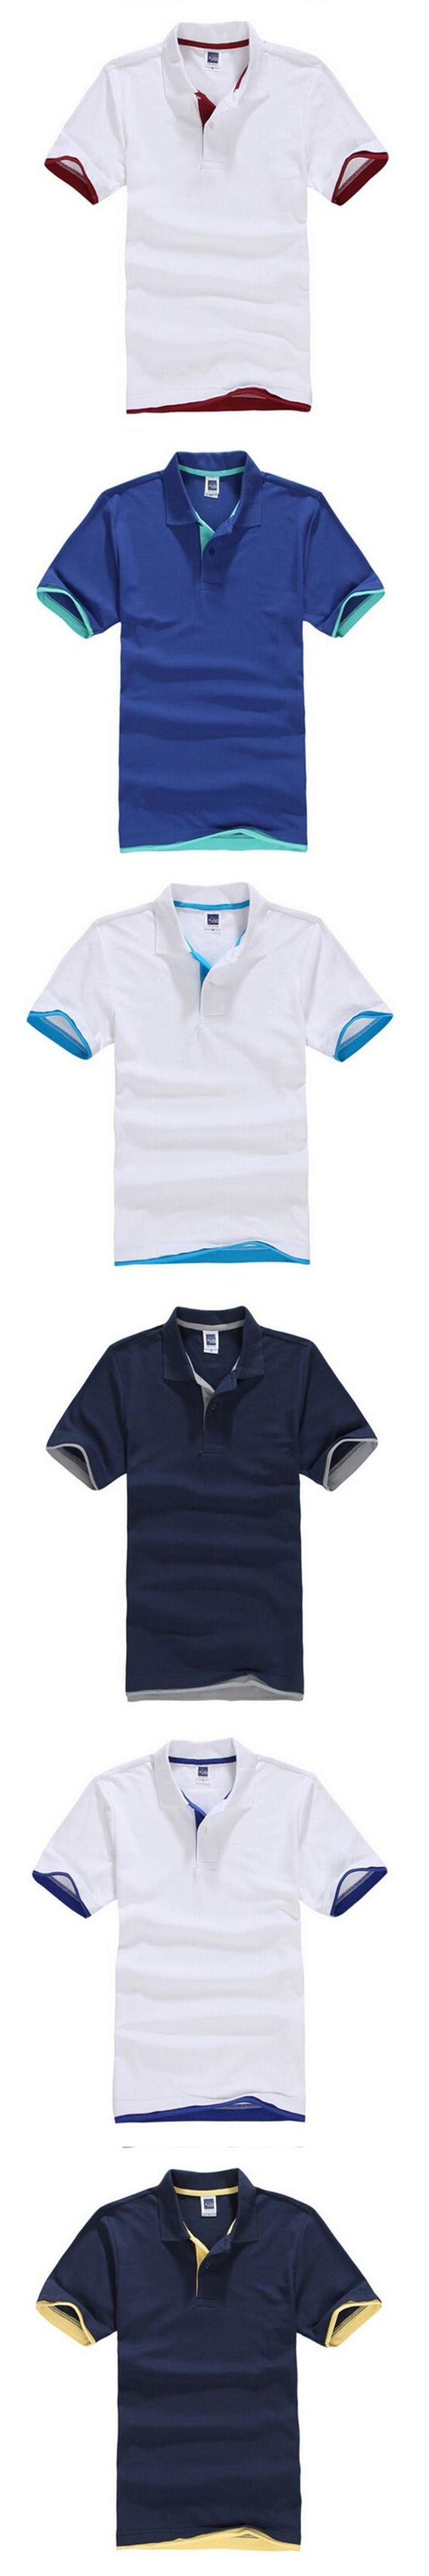 Brand cotton male large XXXL gray black white shirt breathable short sleeve men summer POIOS sales 2017 S ~ 3XL shirt